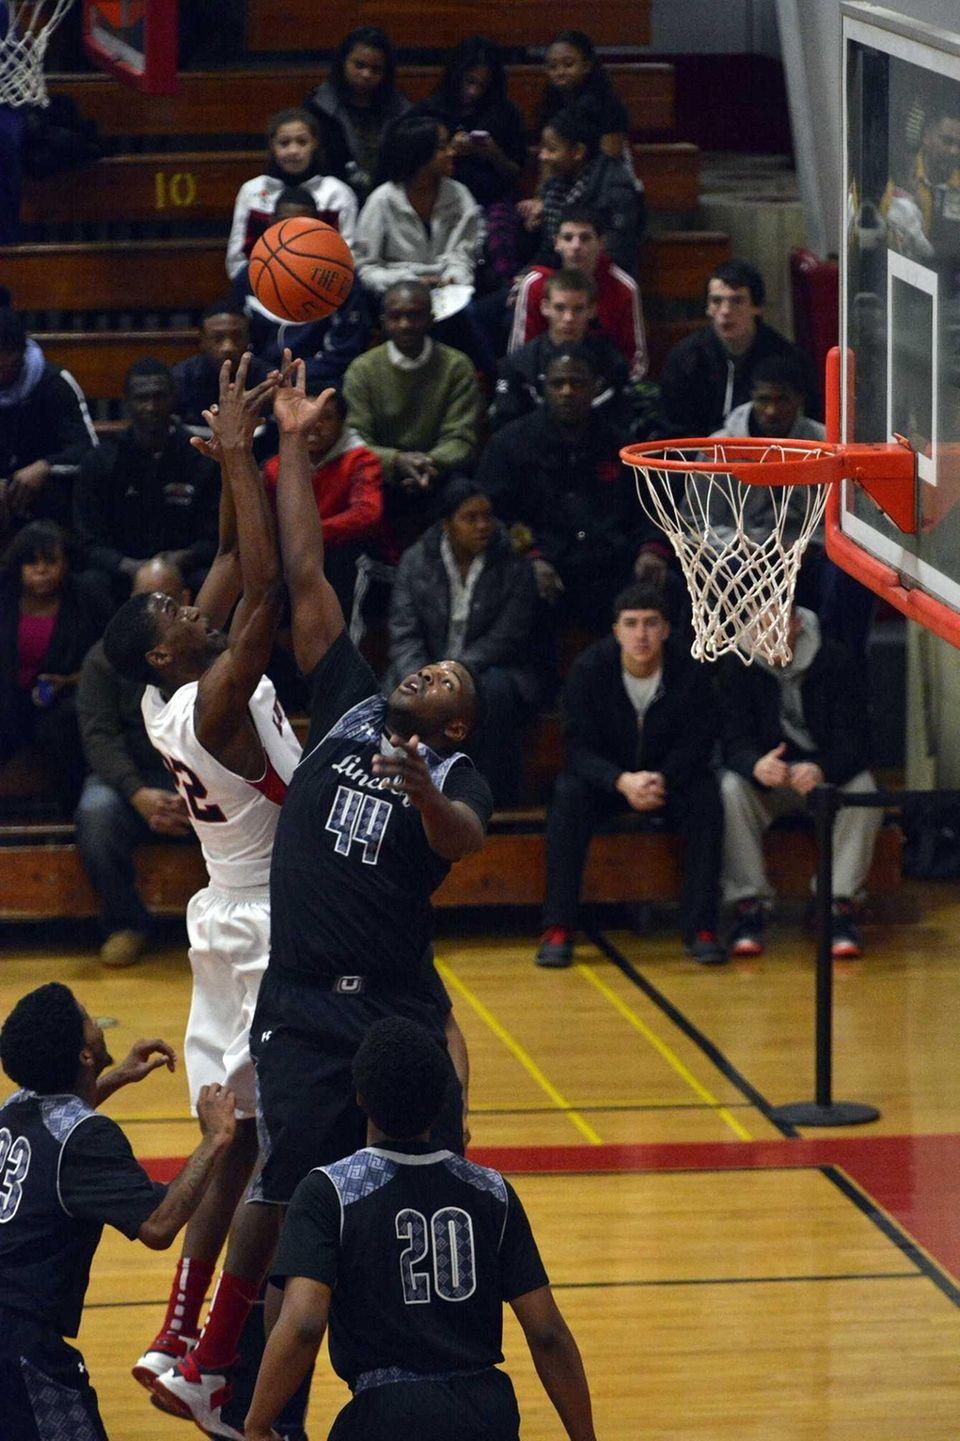 Lutheran center/forward Kentan Facey battles for a rebound